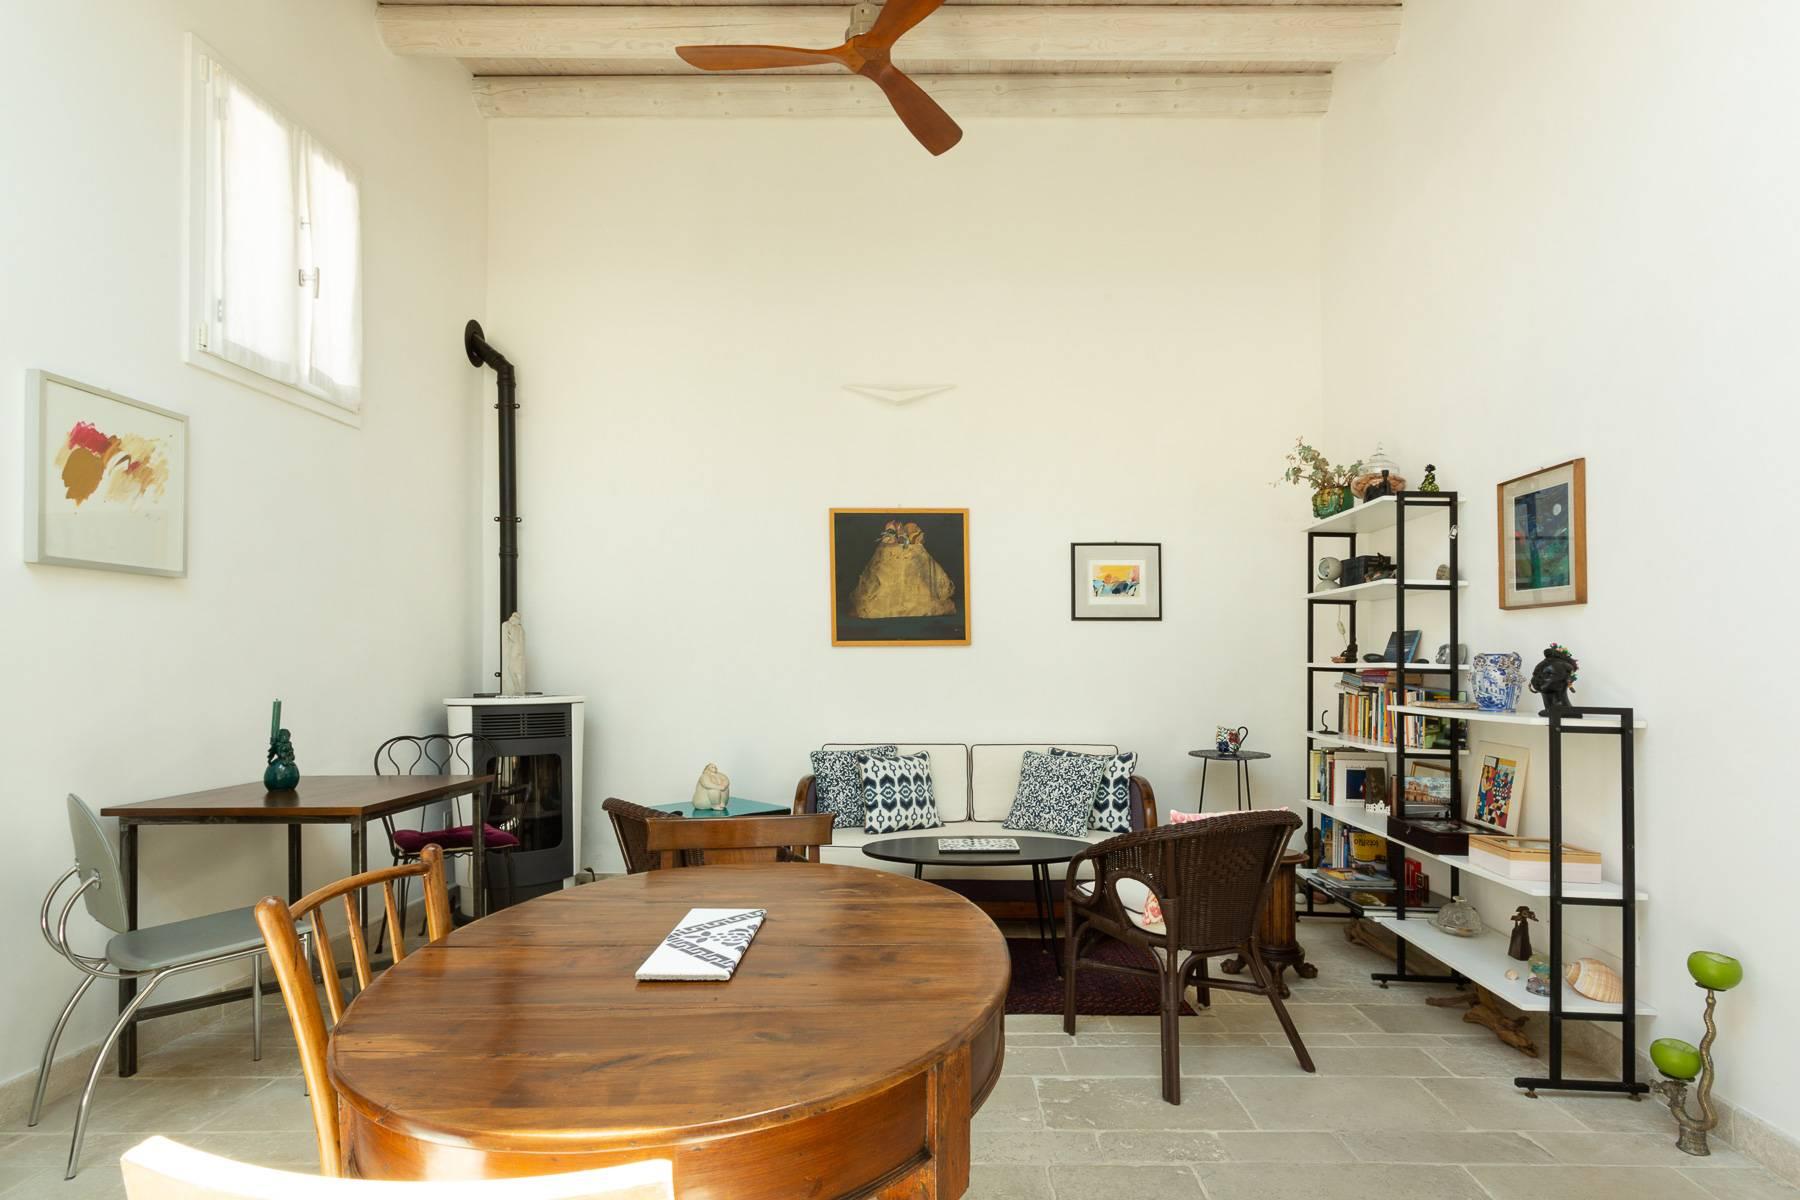 Casa indipendente in Vendita a Noto: 5 locali, 171 mq - Foto 11